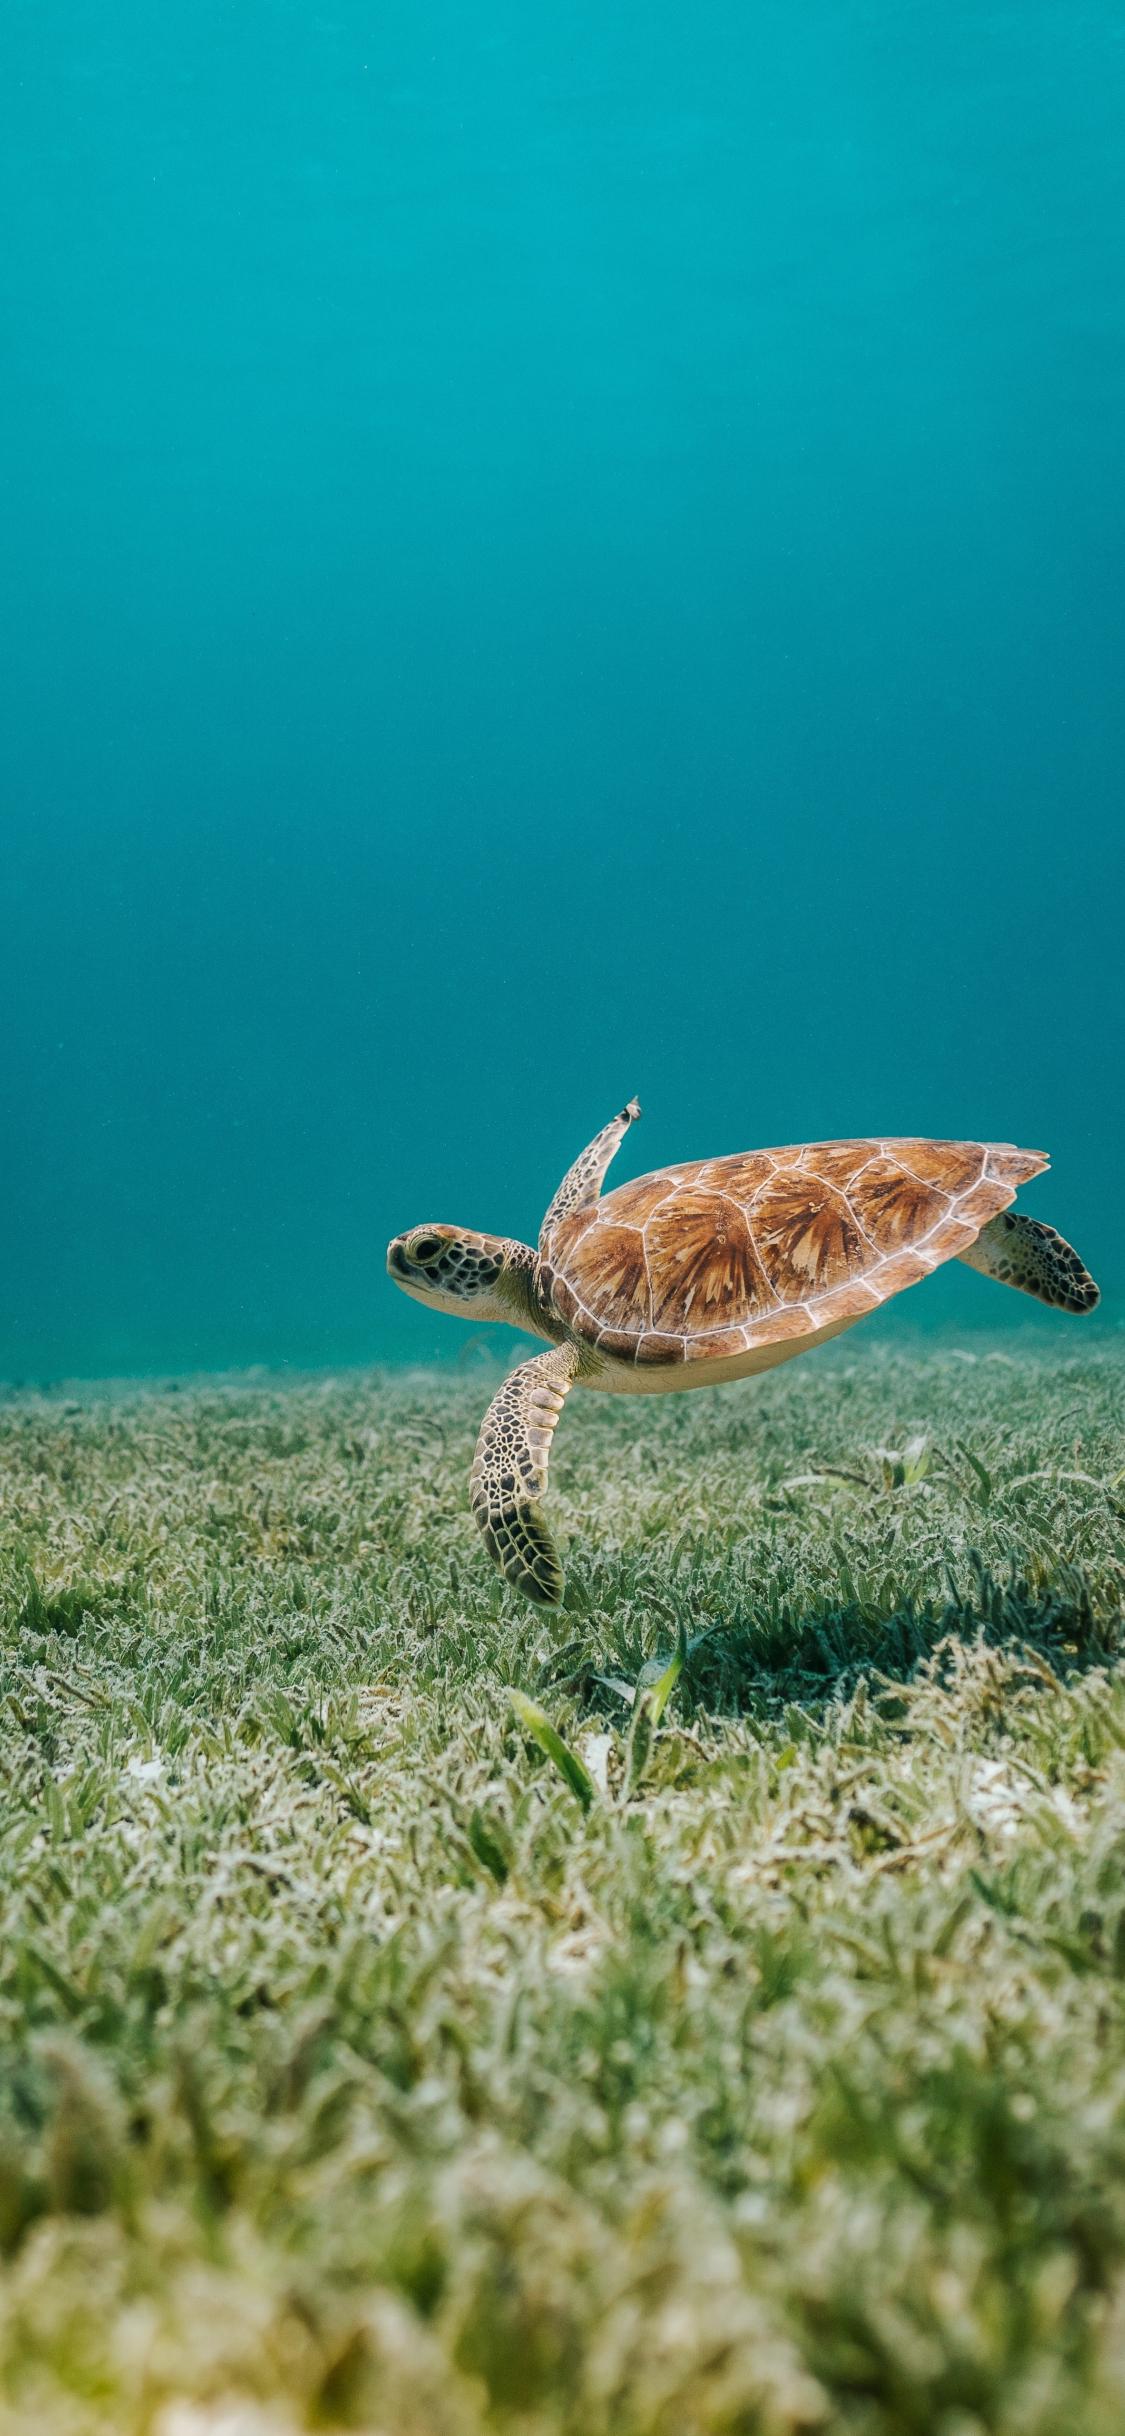 Download 1125x2436 Wallpaper Sealife Turtle Reptile